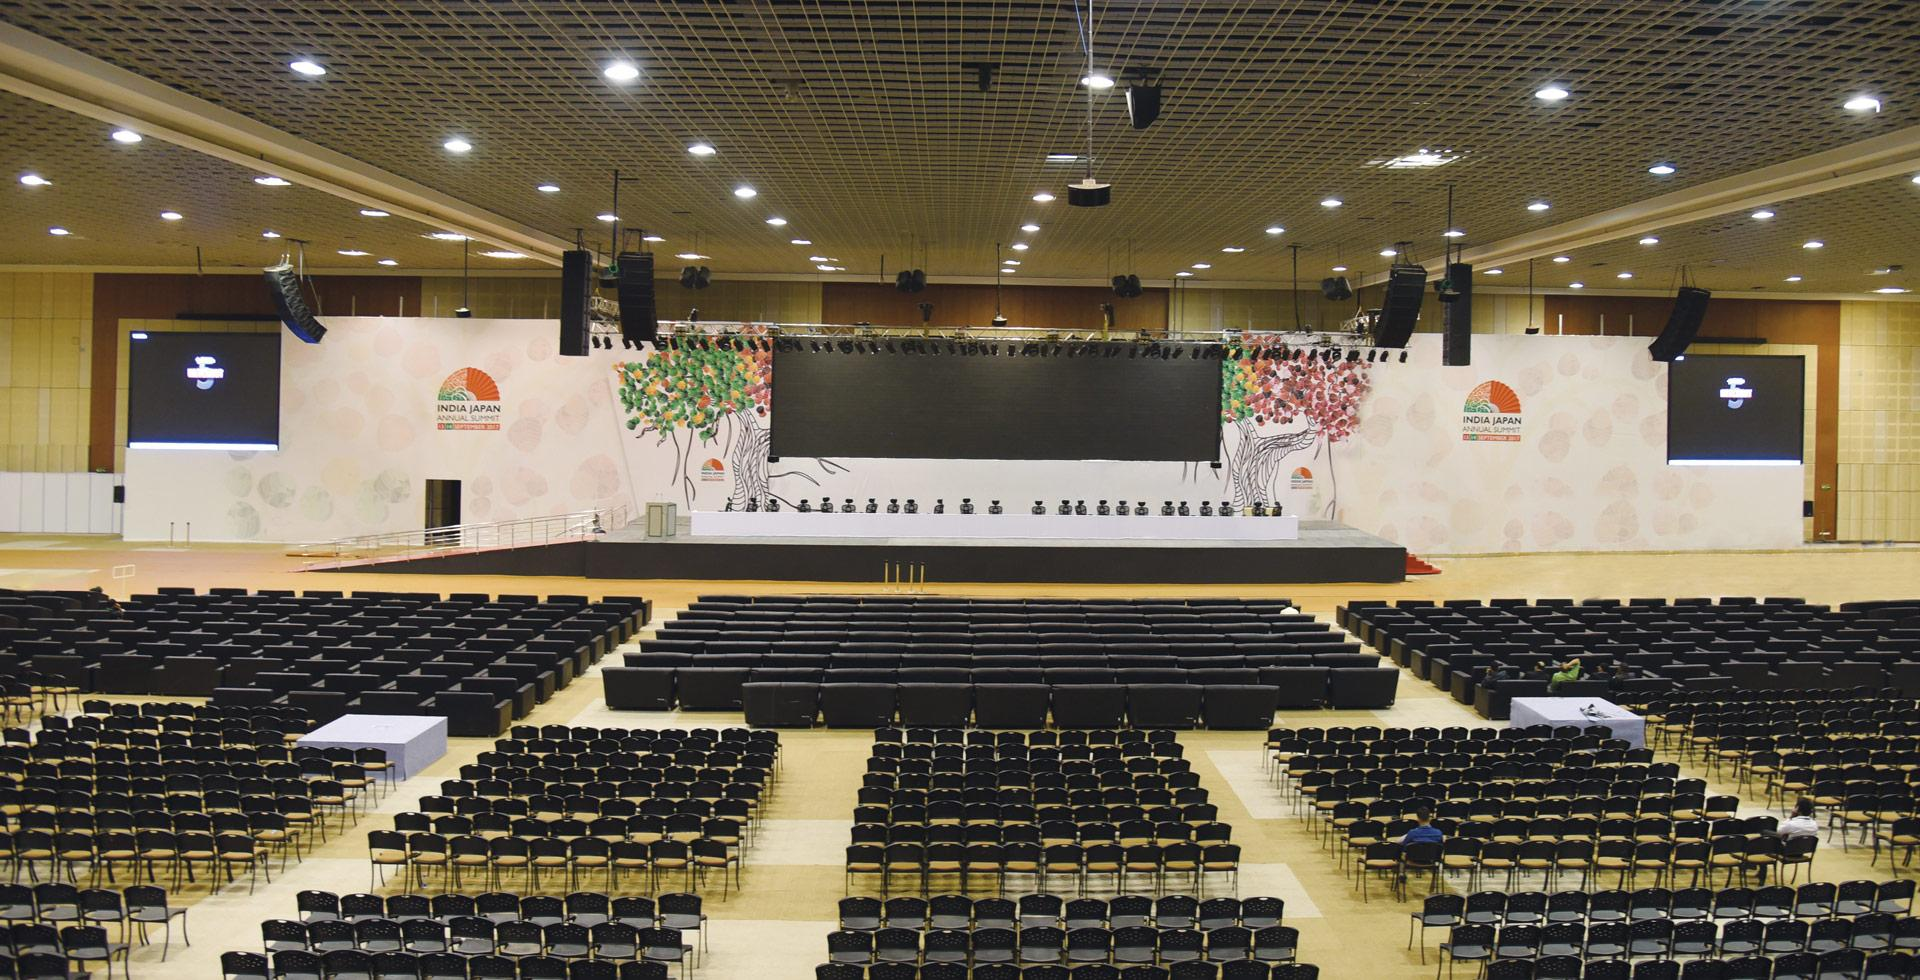 Mahatma Mandir Convention and Exhibition Centre